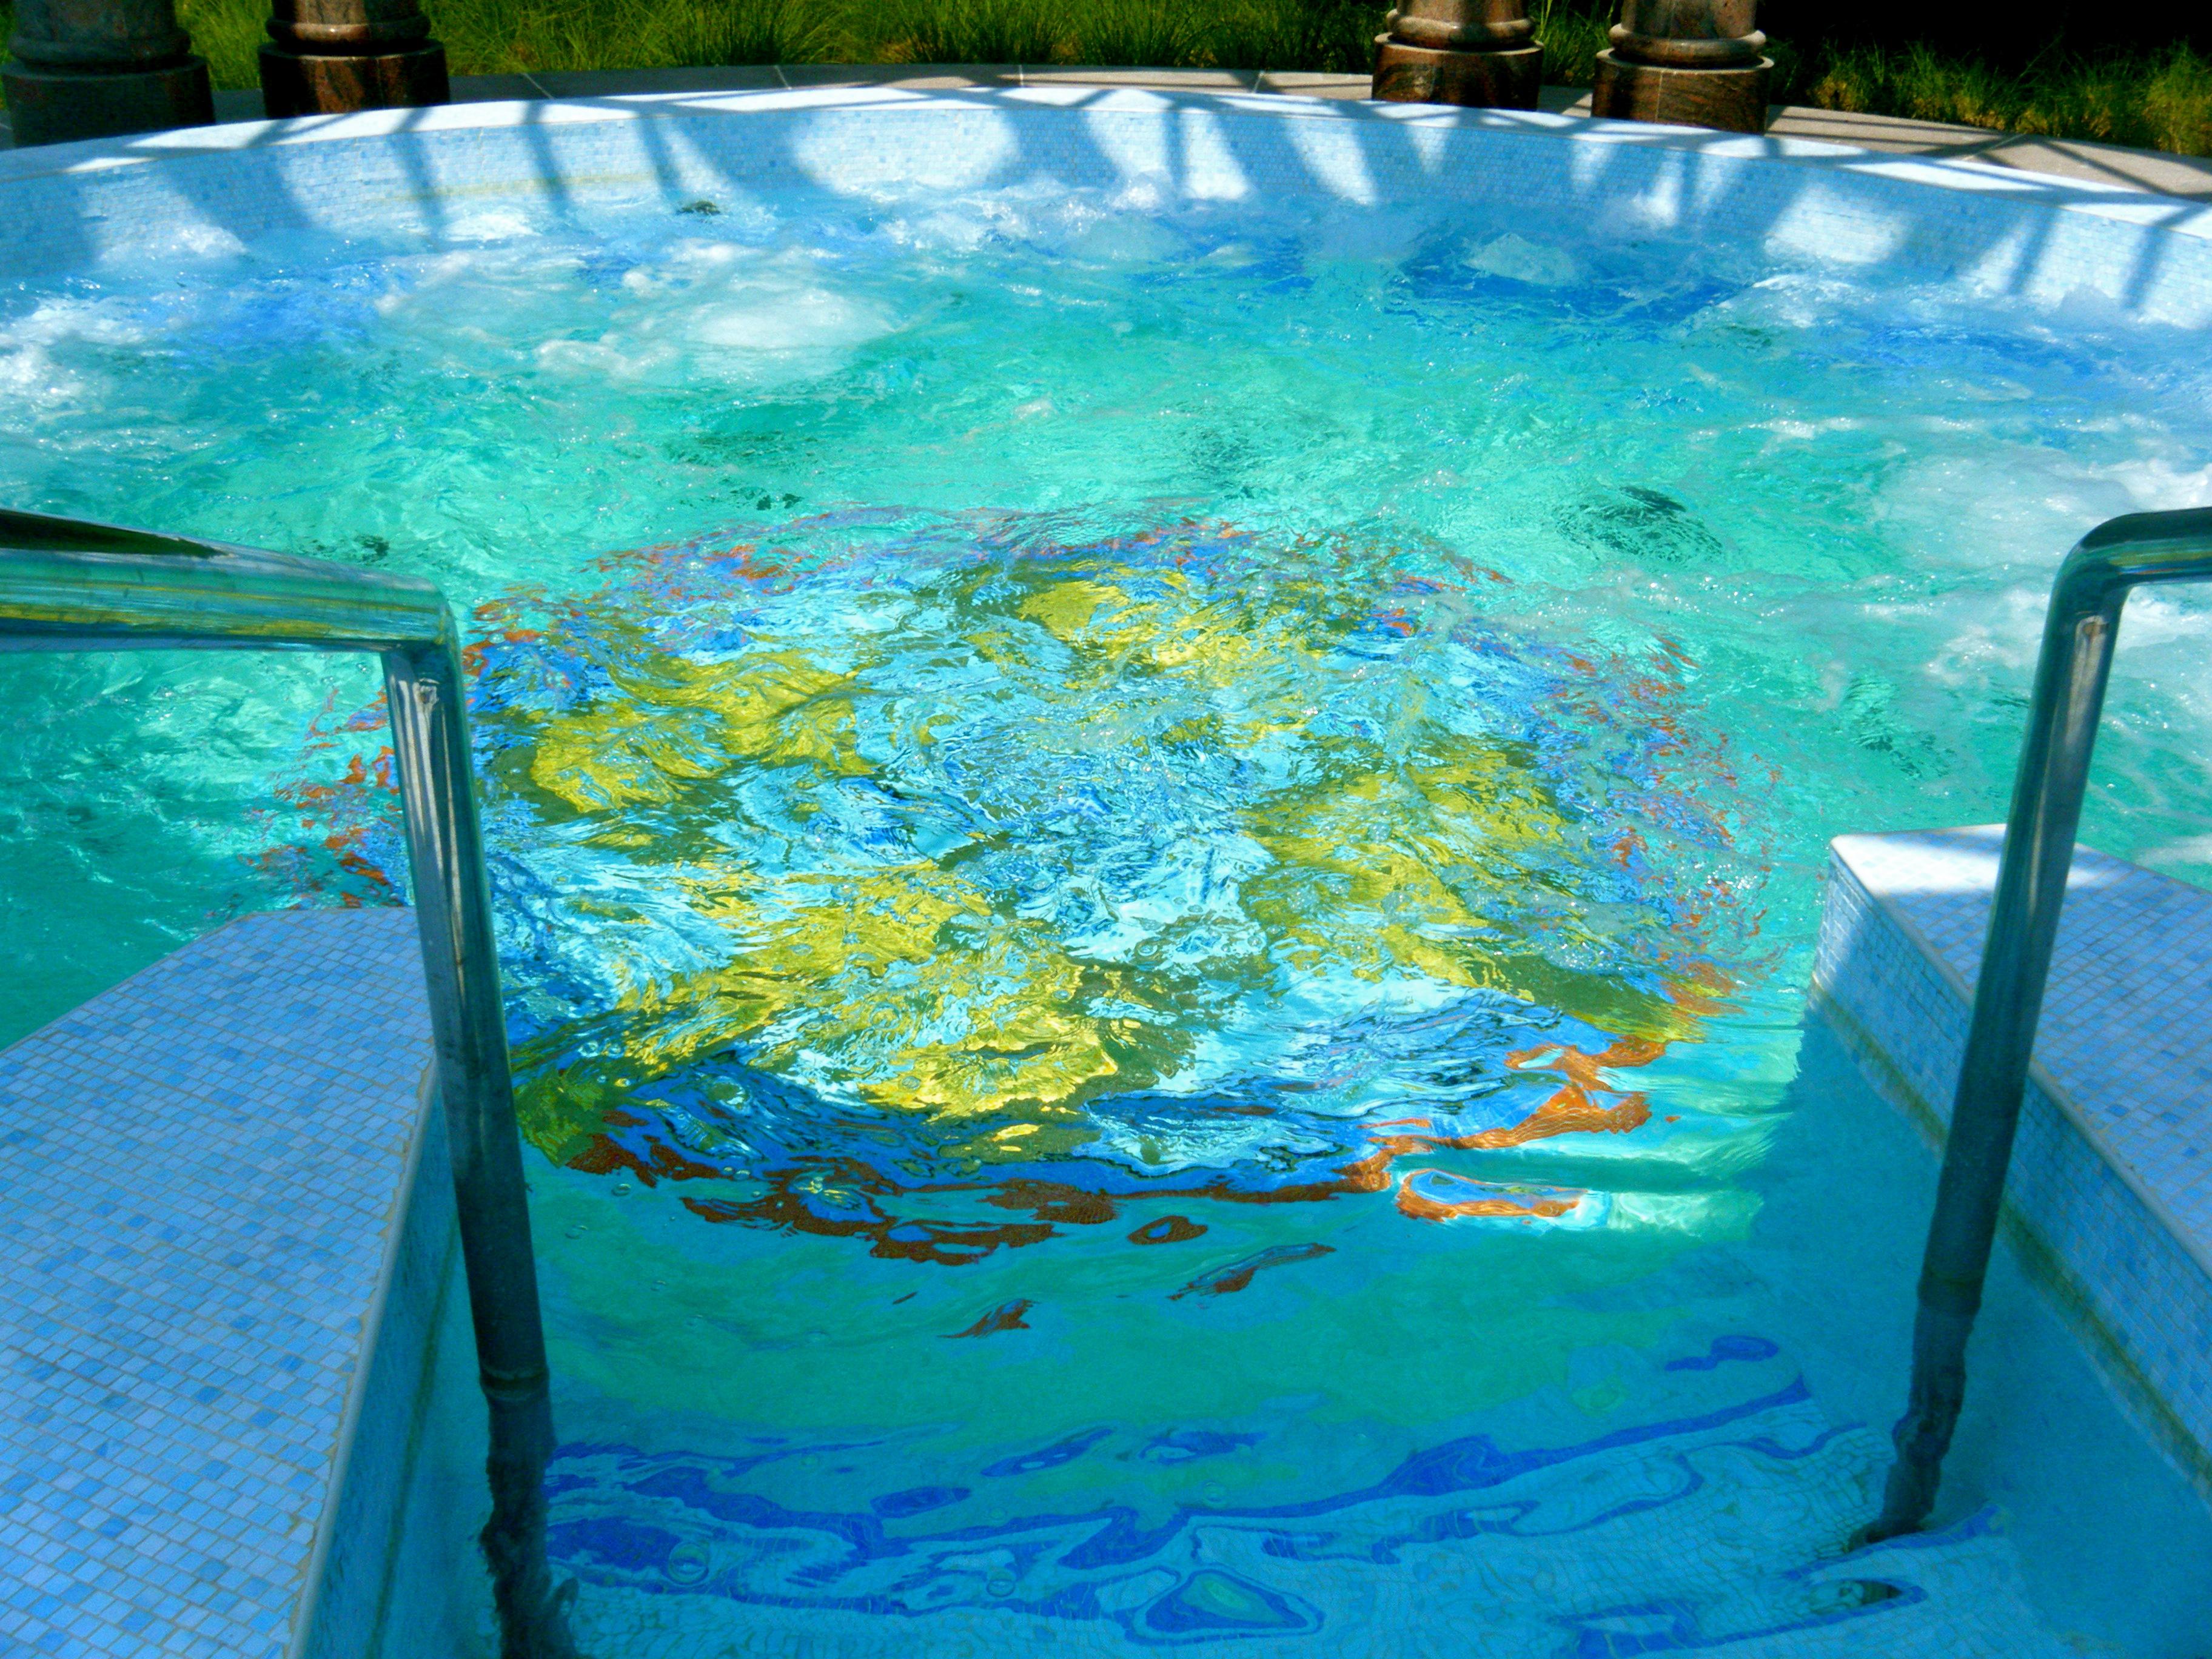 impressionnant piscine pour b b toulouse piscine. Black Bedroom Furniture Sets. Home Design Ideas